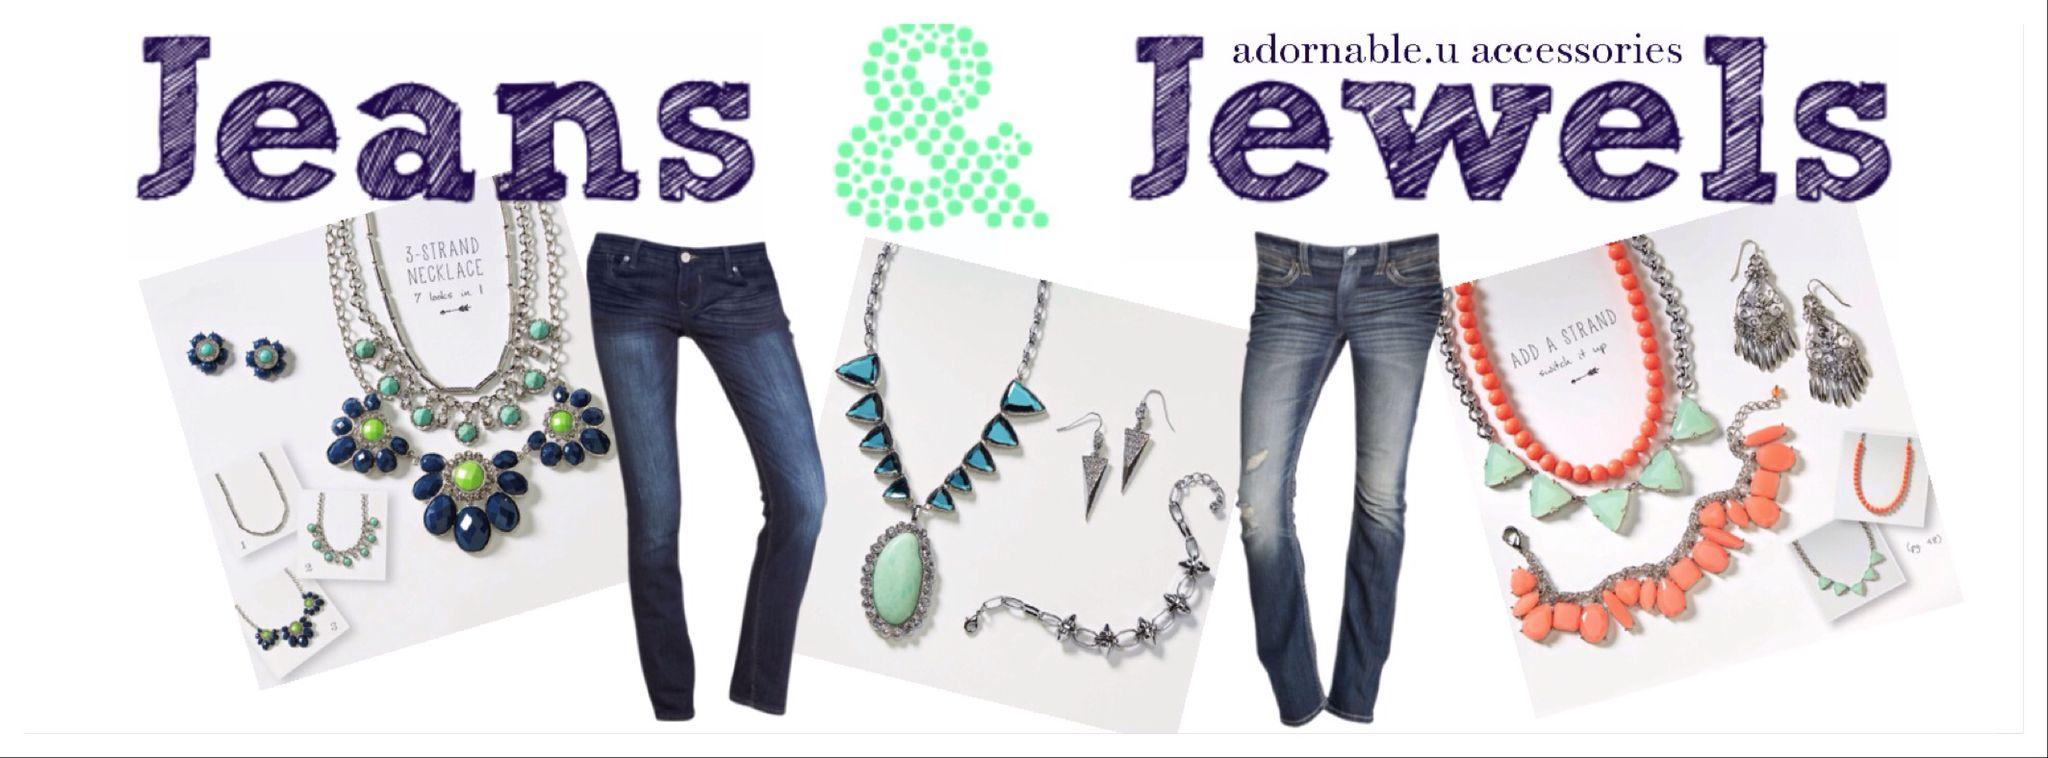 Gmail more themes -  Getadornedwithme Au Sarah Stylecoach Gmail Com Jeans Jewels Adornable